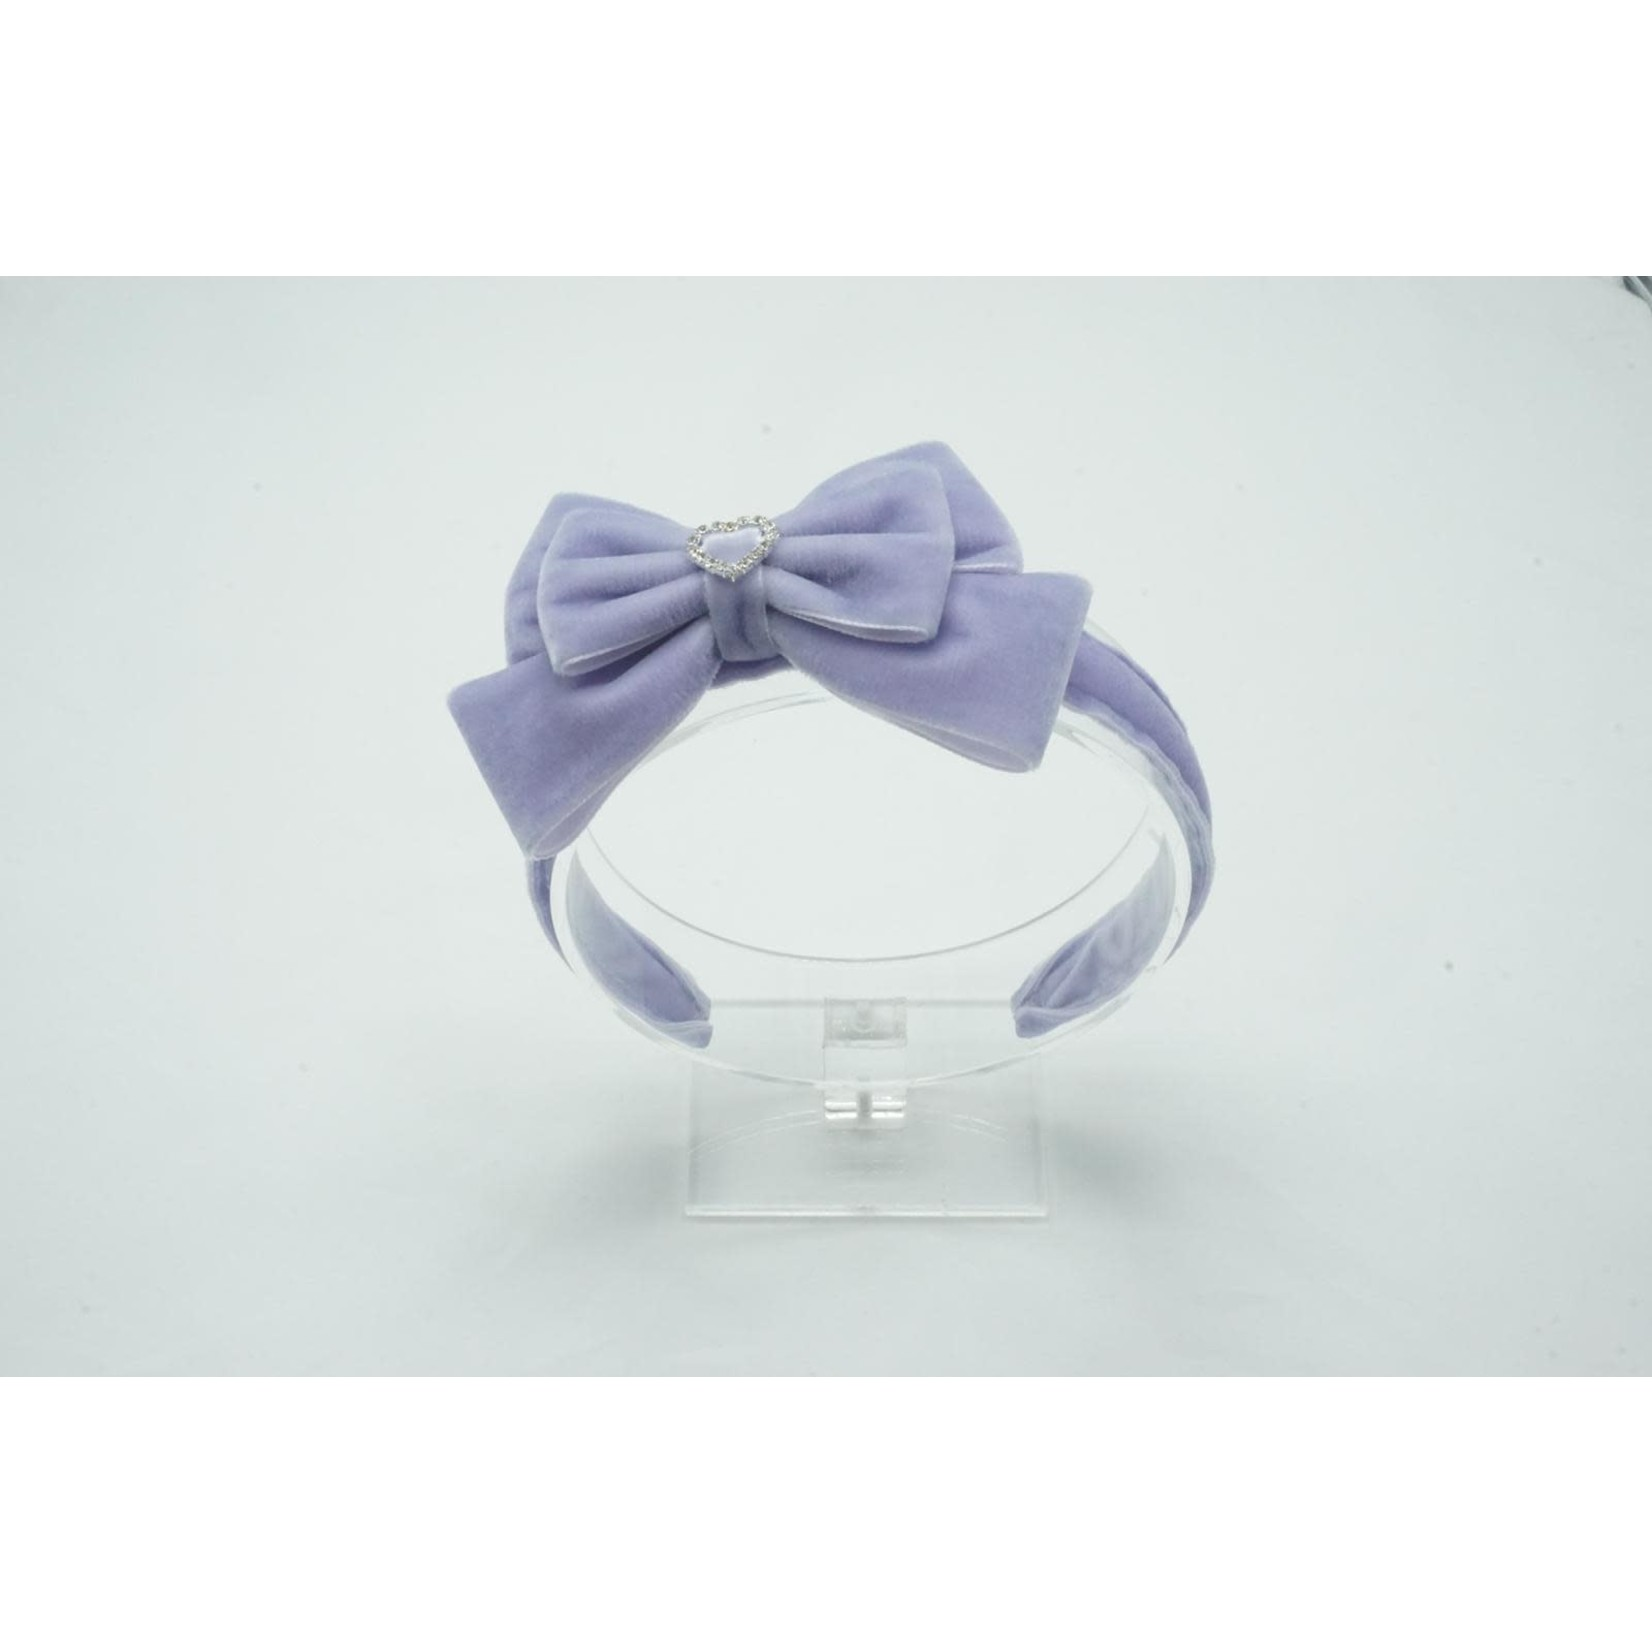 Petite Zara Velvet Diadeem Butterfly Bow - Mauve